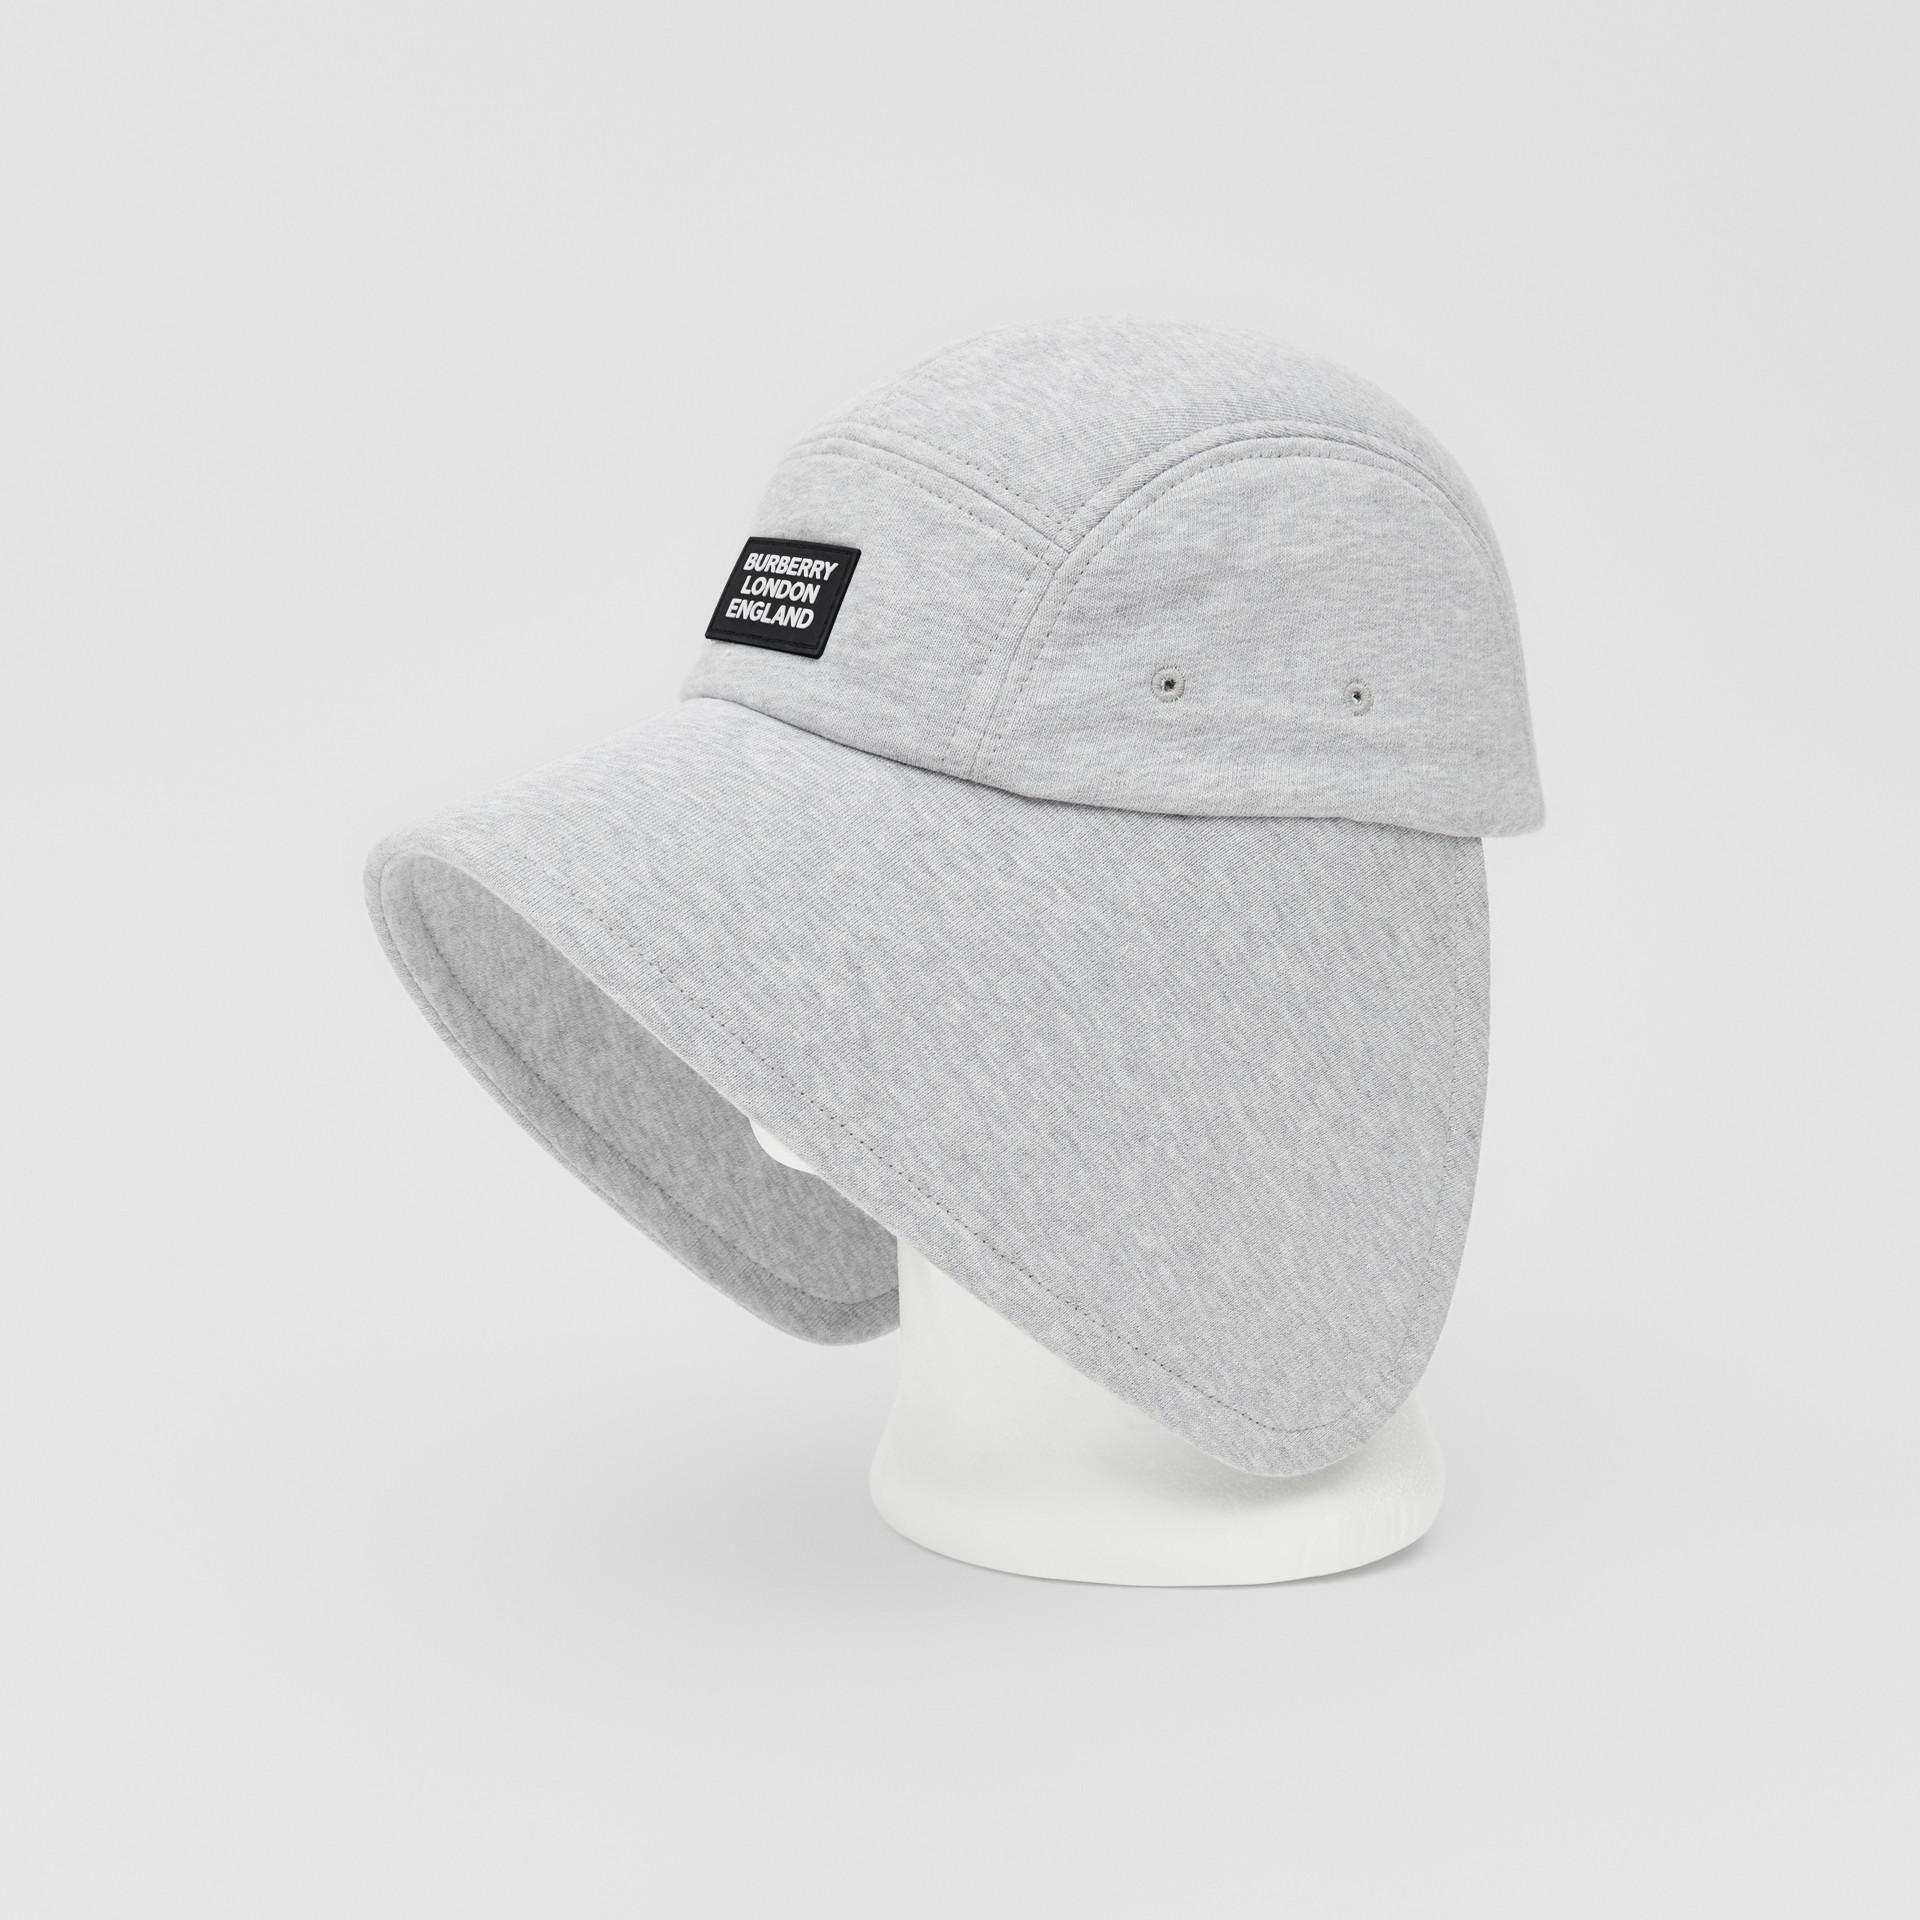 Hauben-Kappe aus Baumwolljersey mit Logo-Applikation (Helles Kieselgrau) | Burberry - Galerie-Bild 4